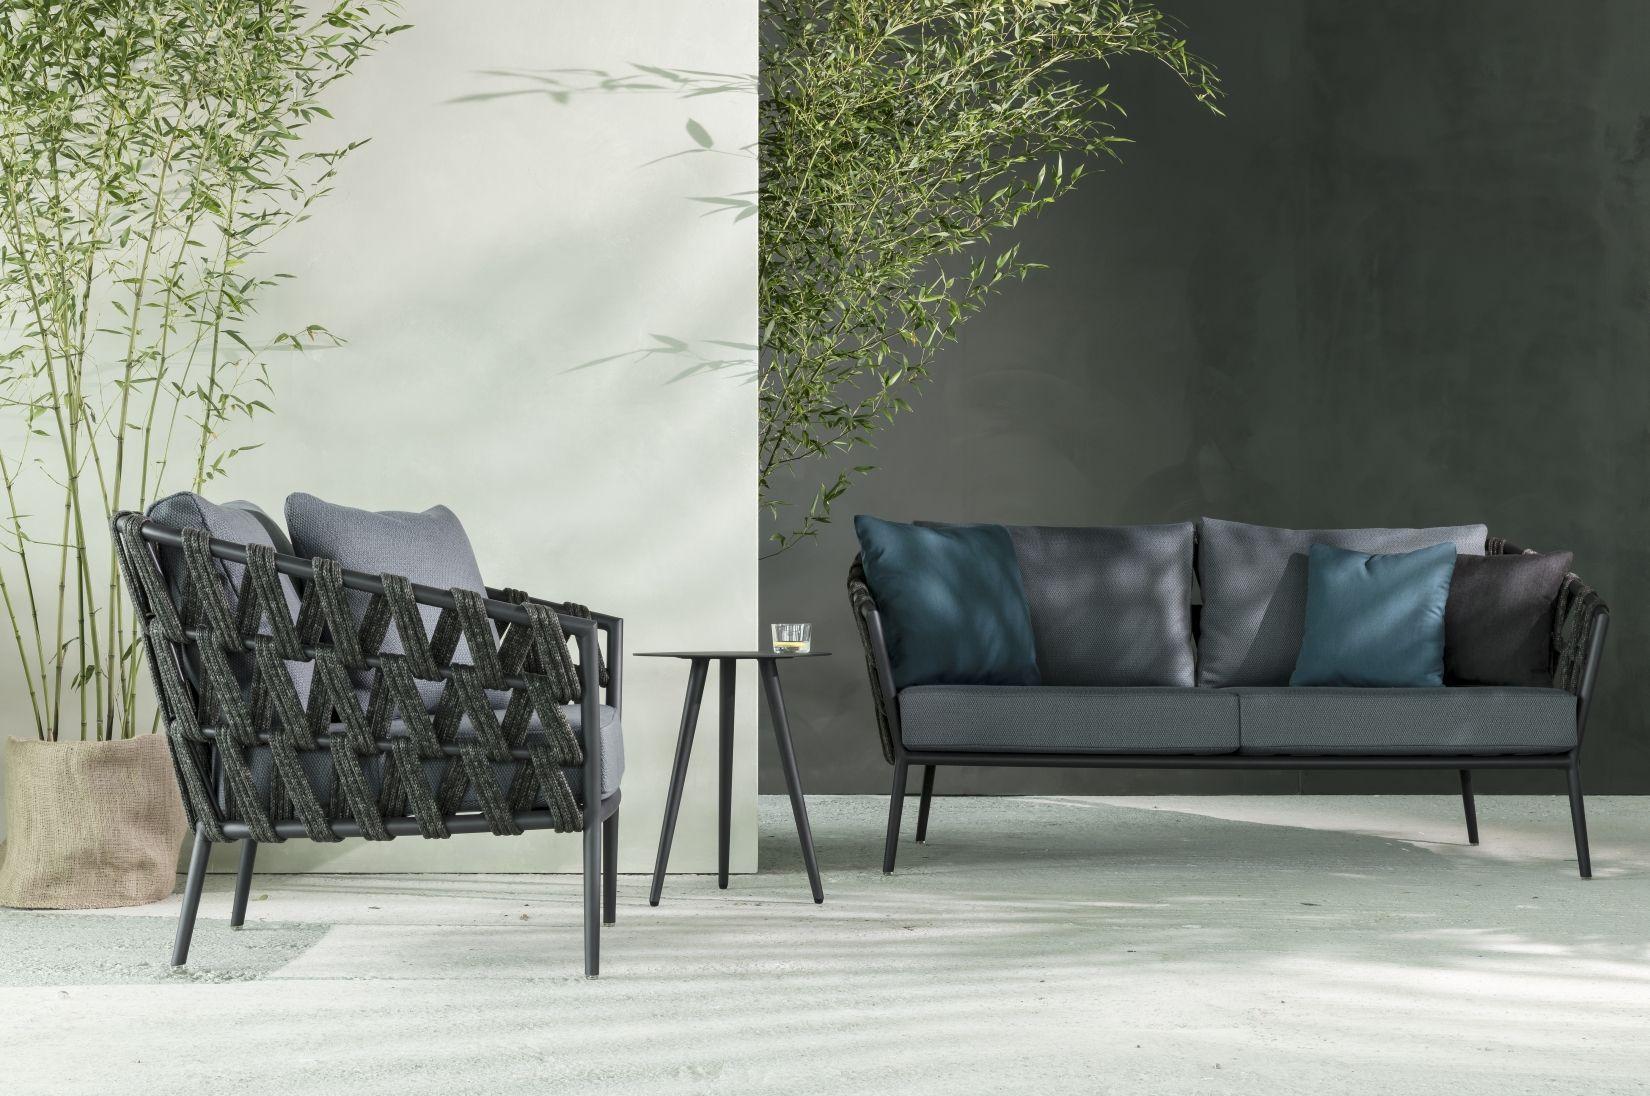 Vincent Sheppard Outdoor Sofa Leo Bei Villatmo.de | VILLATMO   Designer  Möbel, Lampen